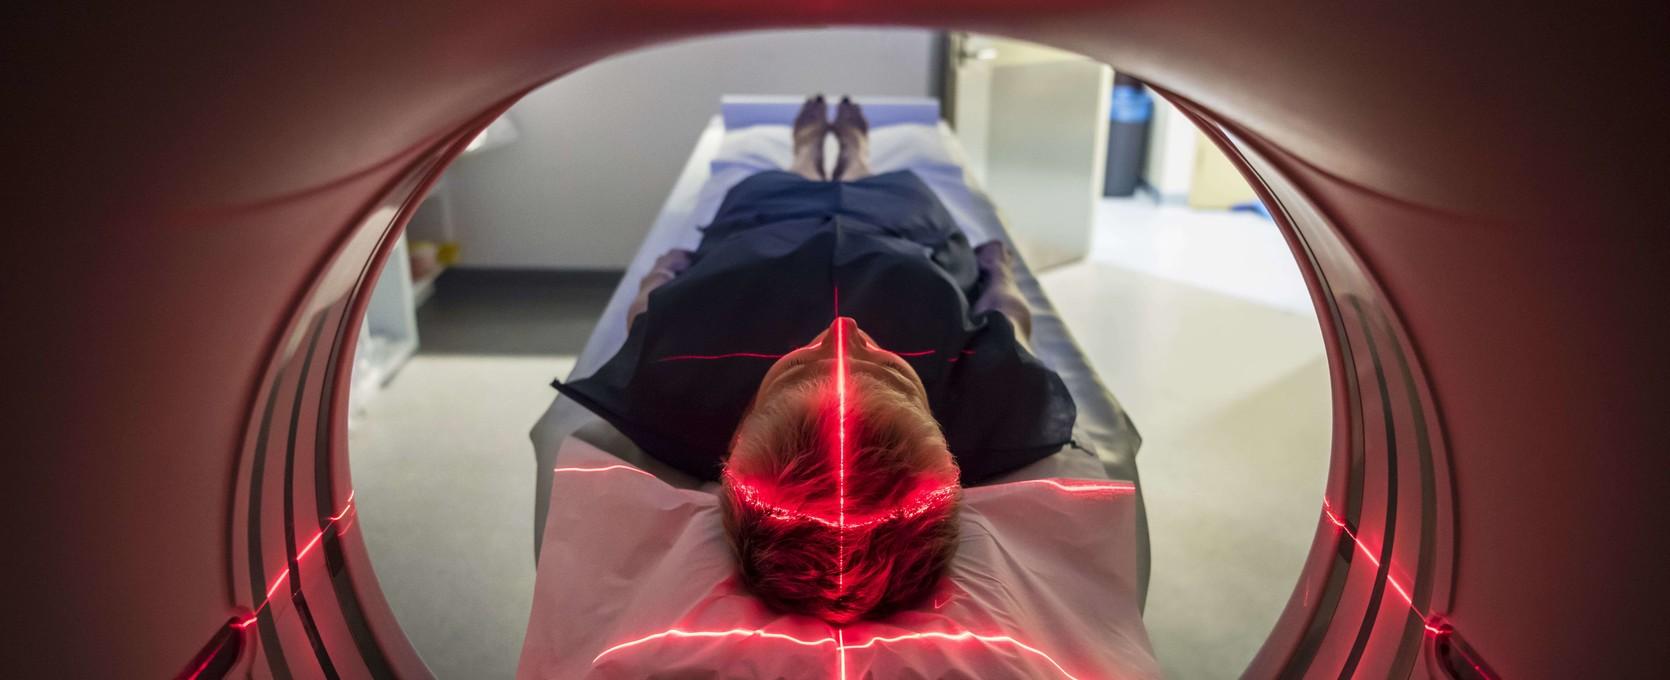 Patient entering a medical device scanner